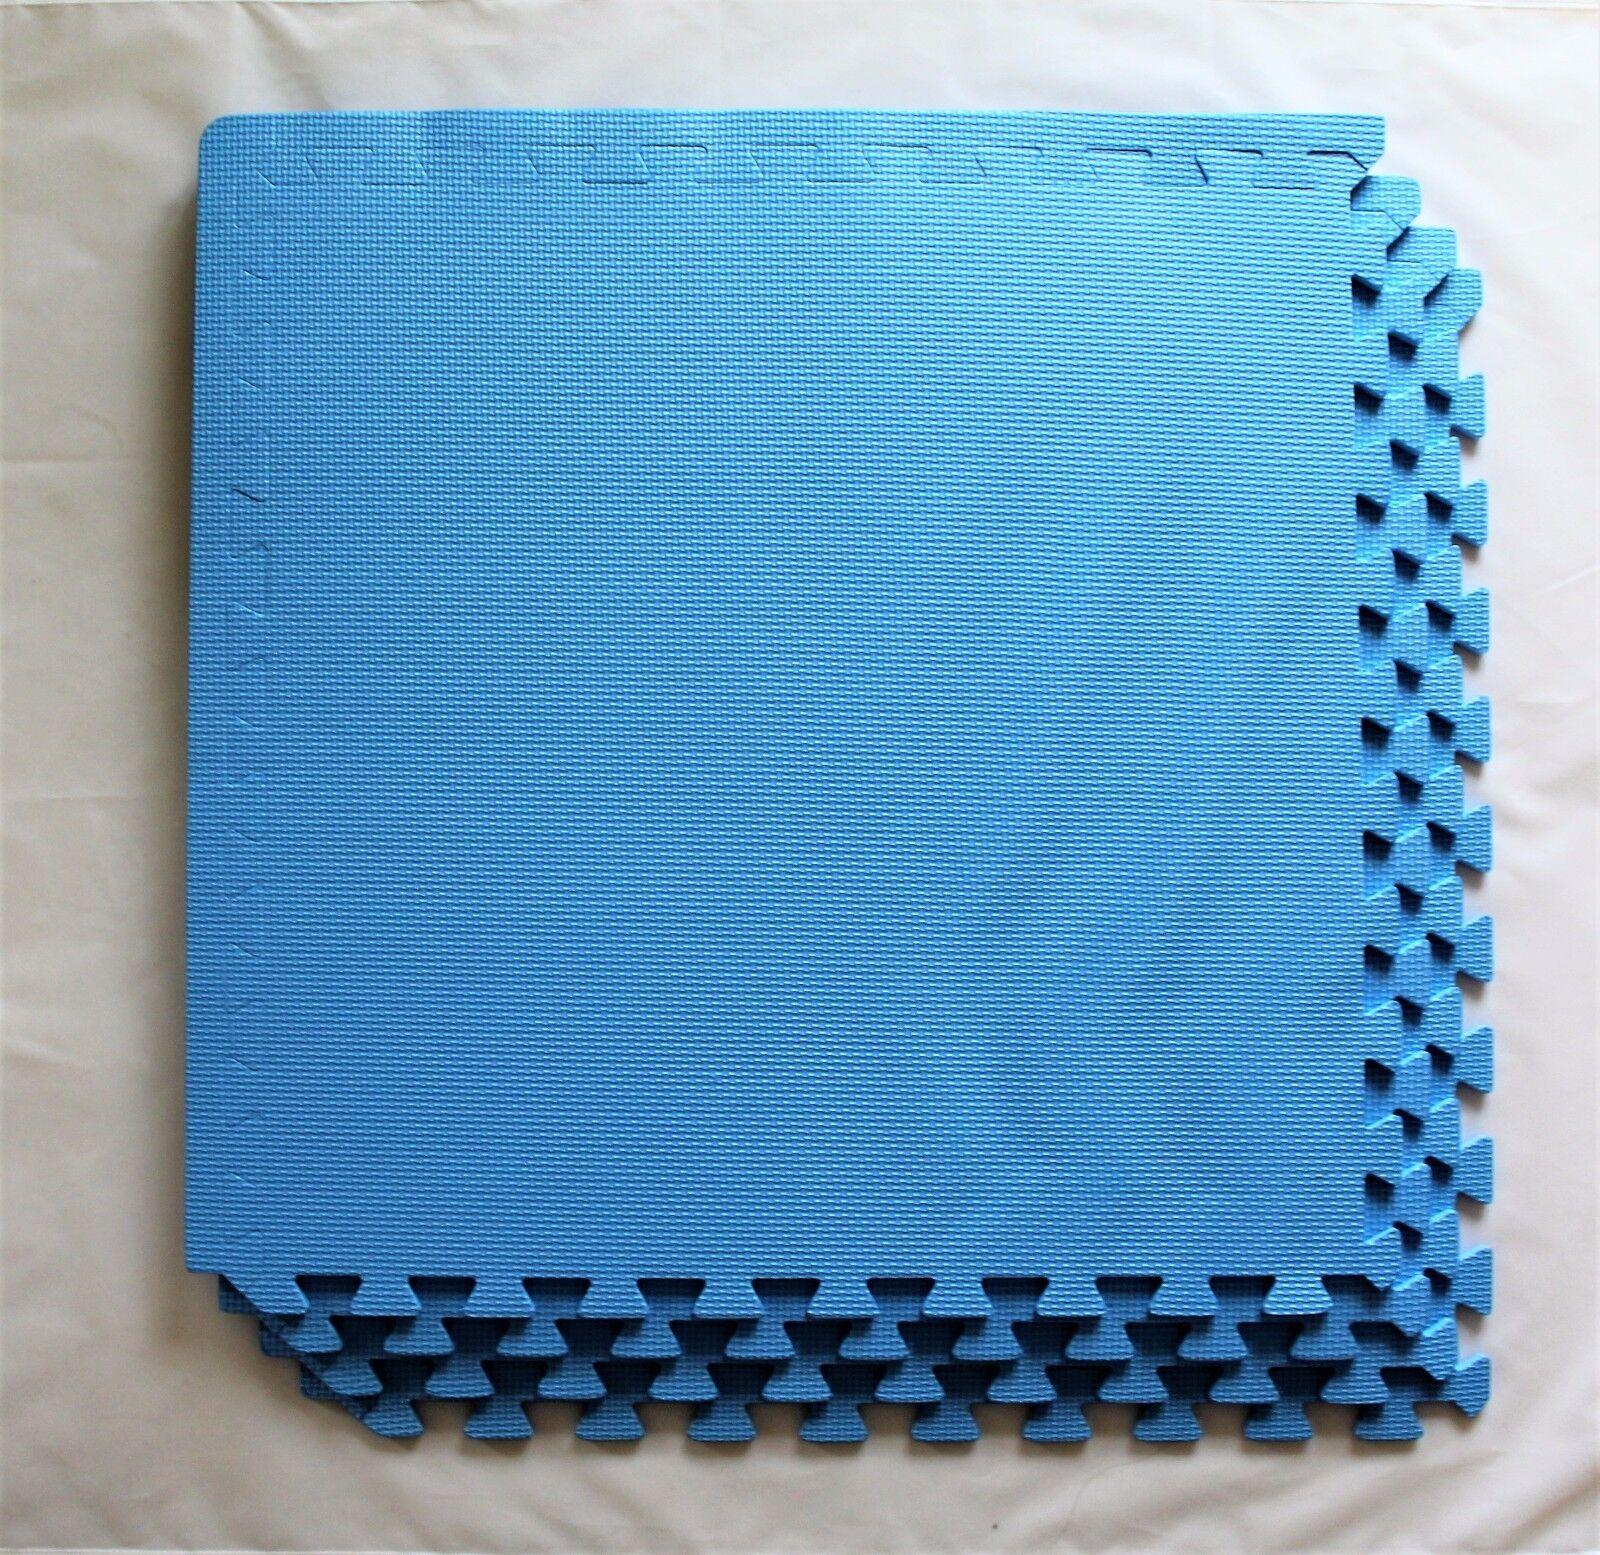 Marko EVA Blue Mat Foam Interlocking 60cm Floor Mats Gym Work Home